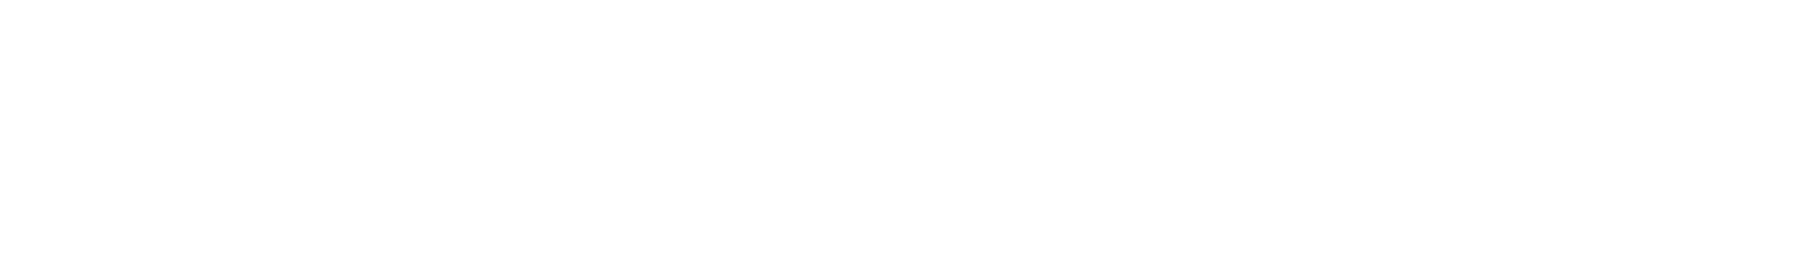 blbc dustygretsch 75 e